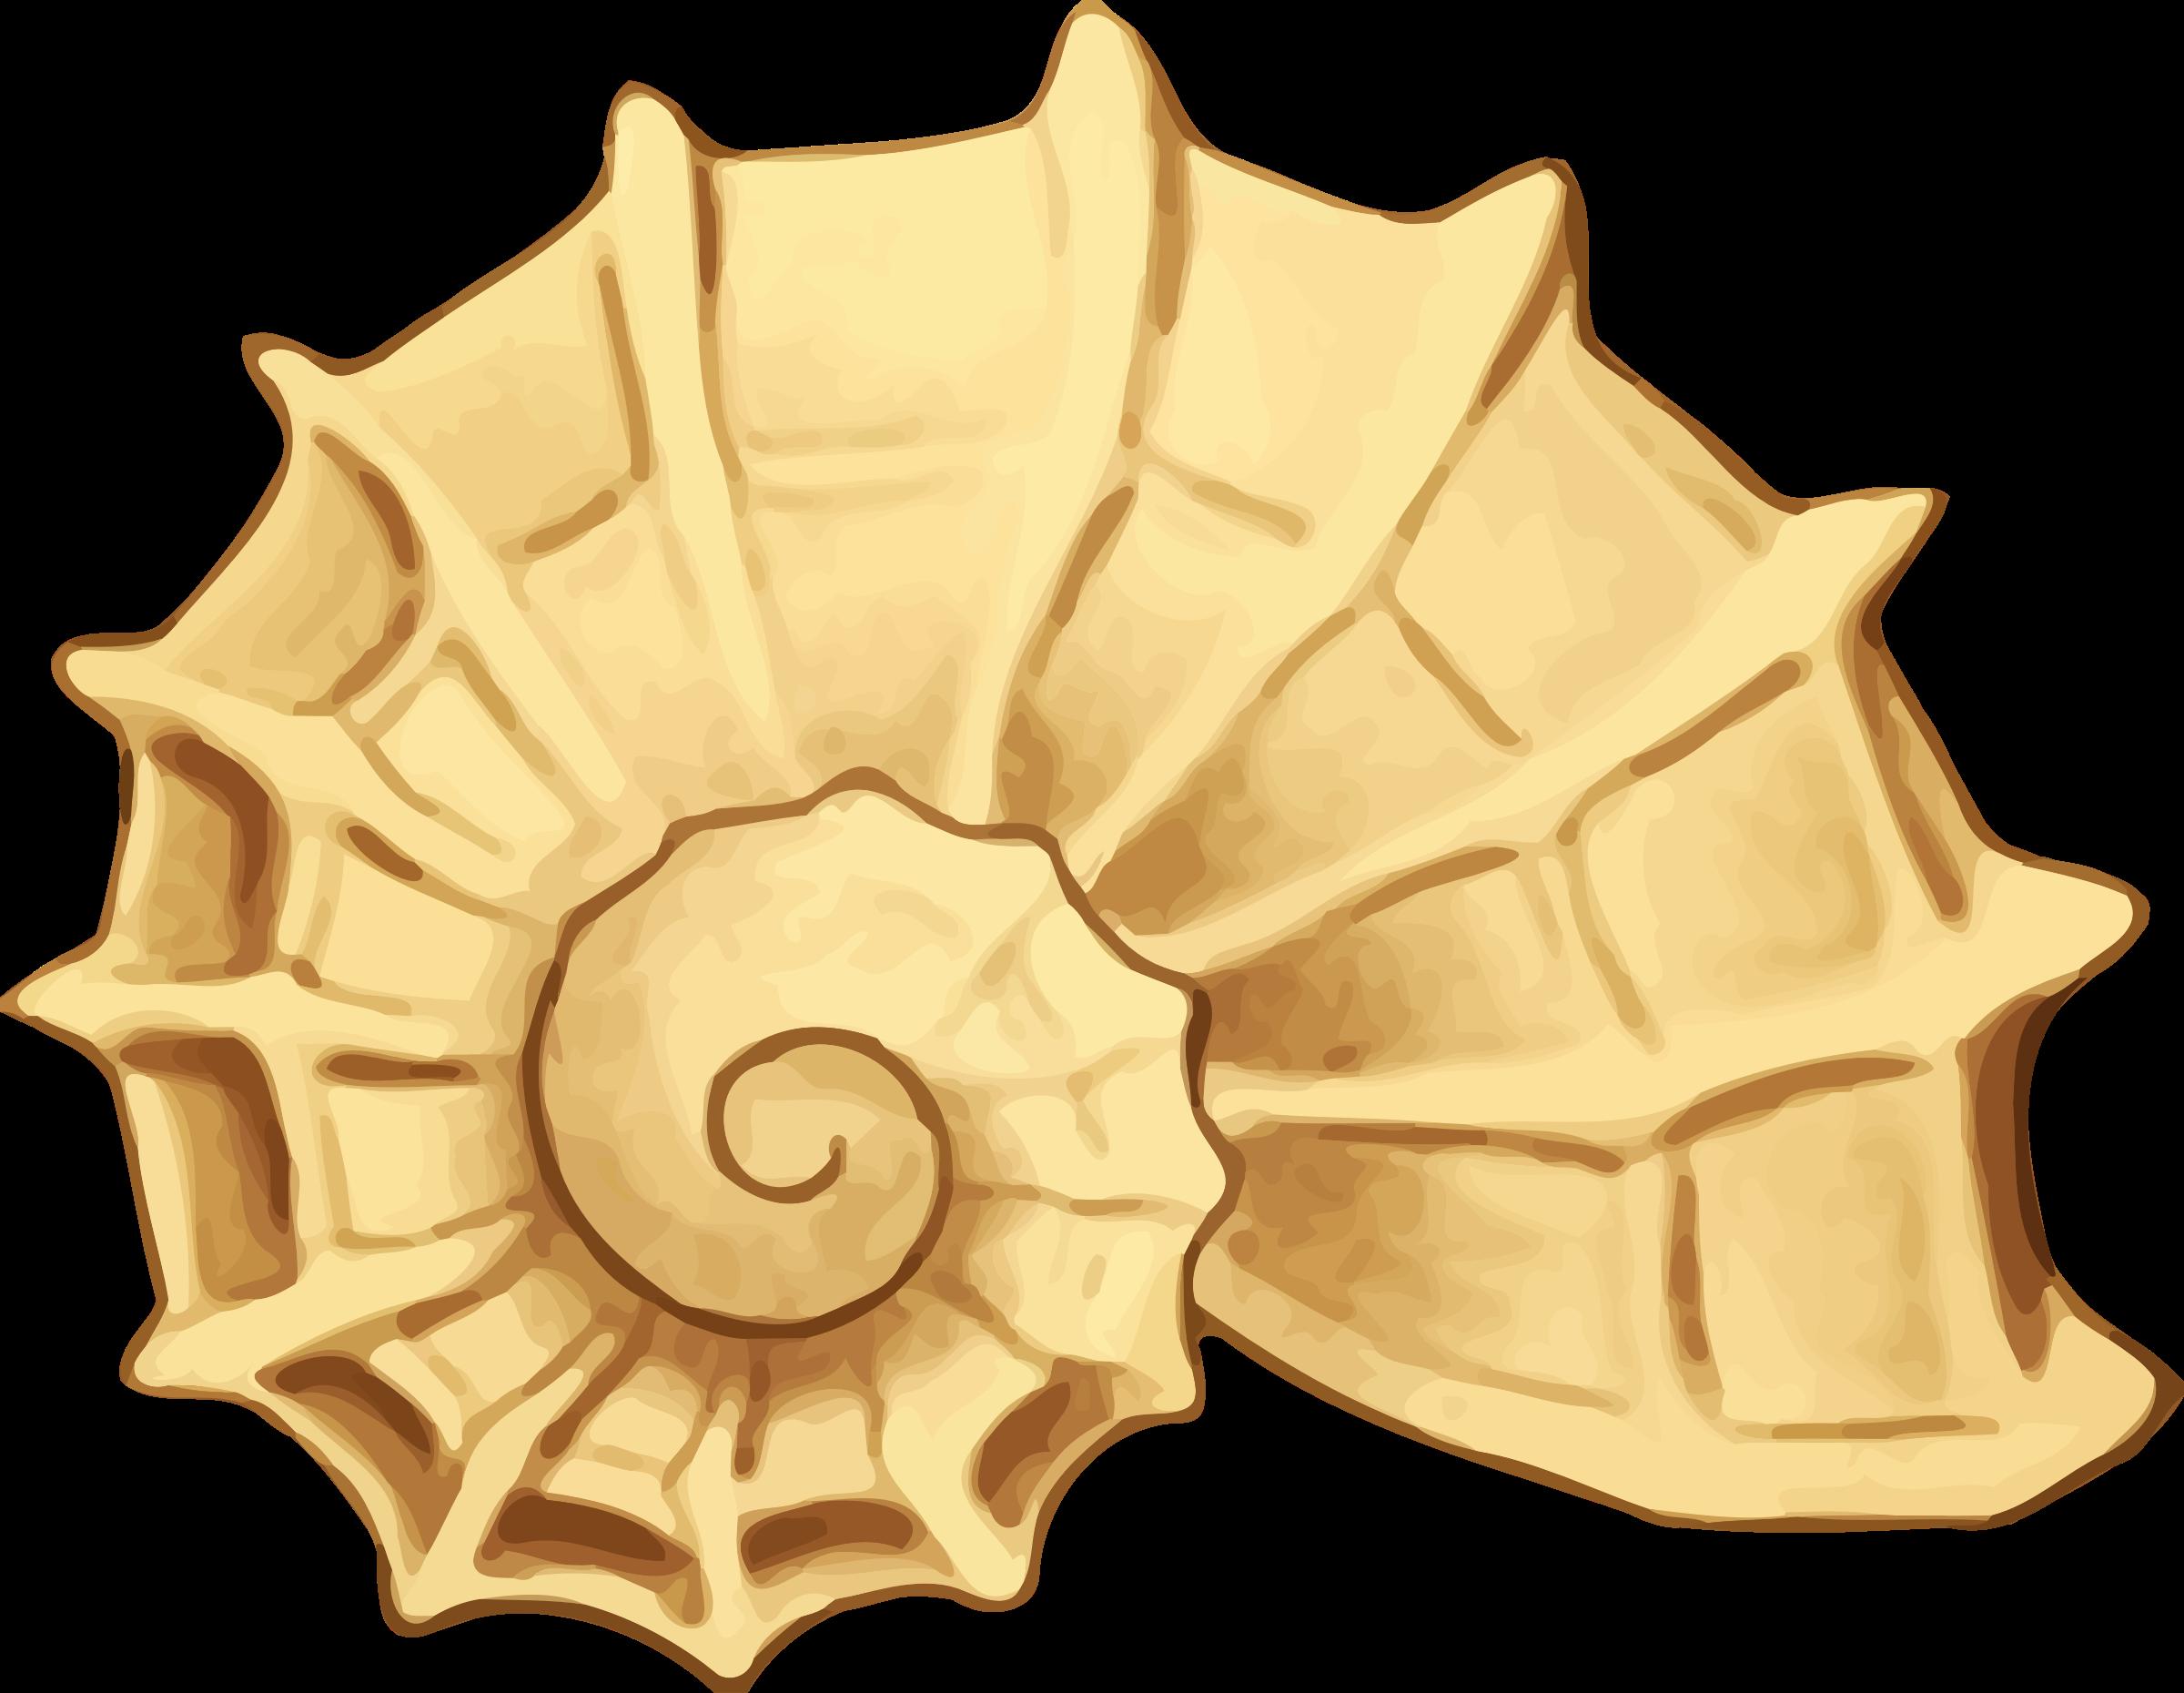 Big image png. Shell clipart sea rock